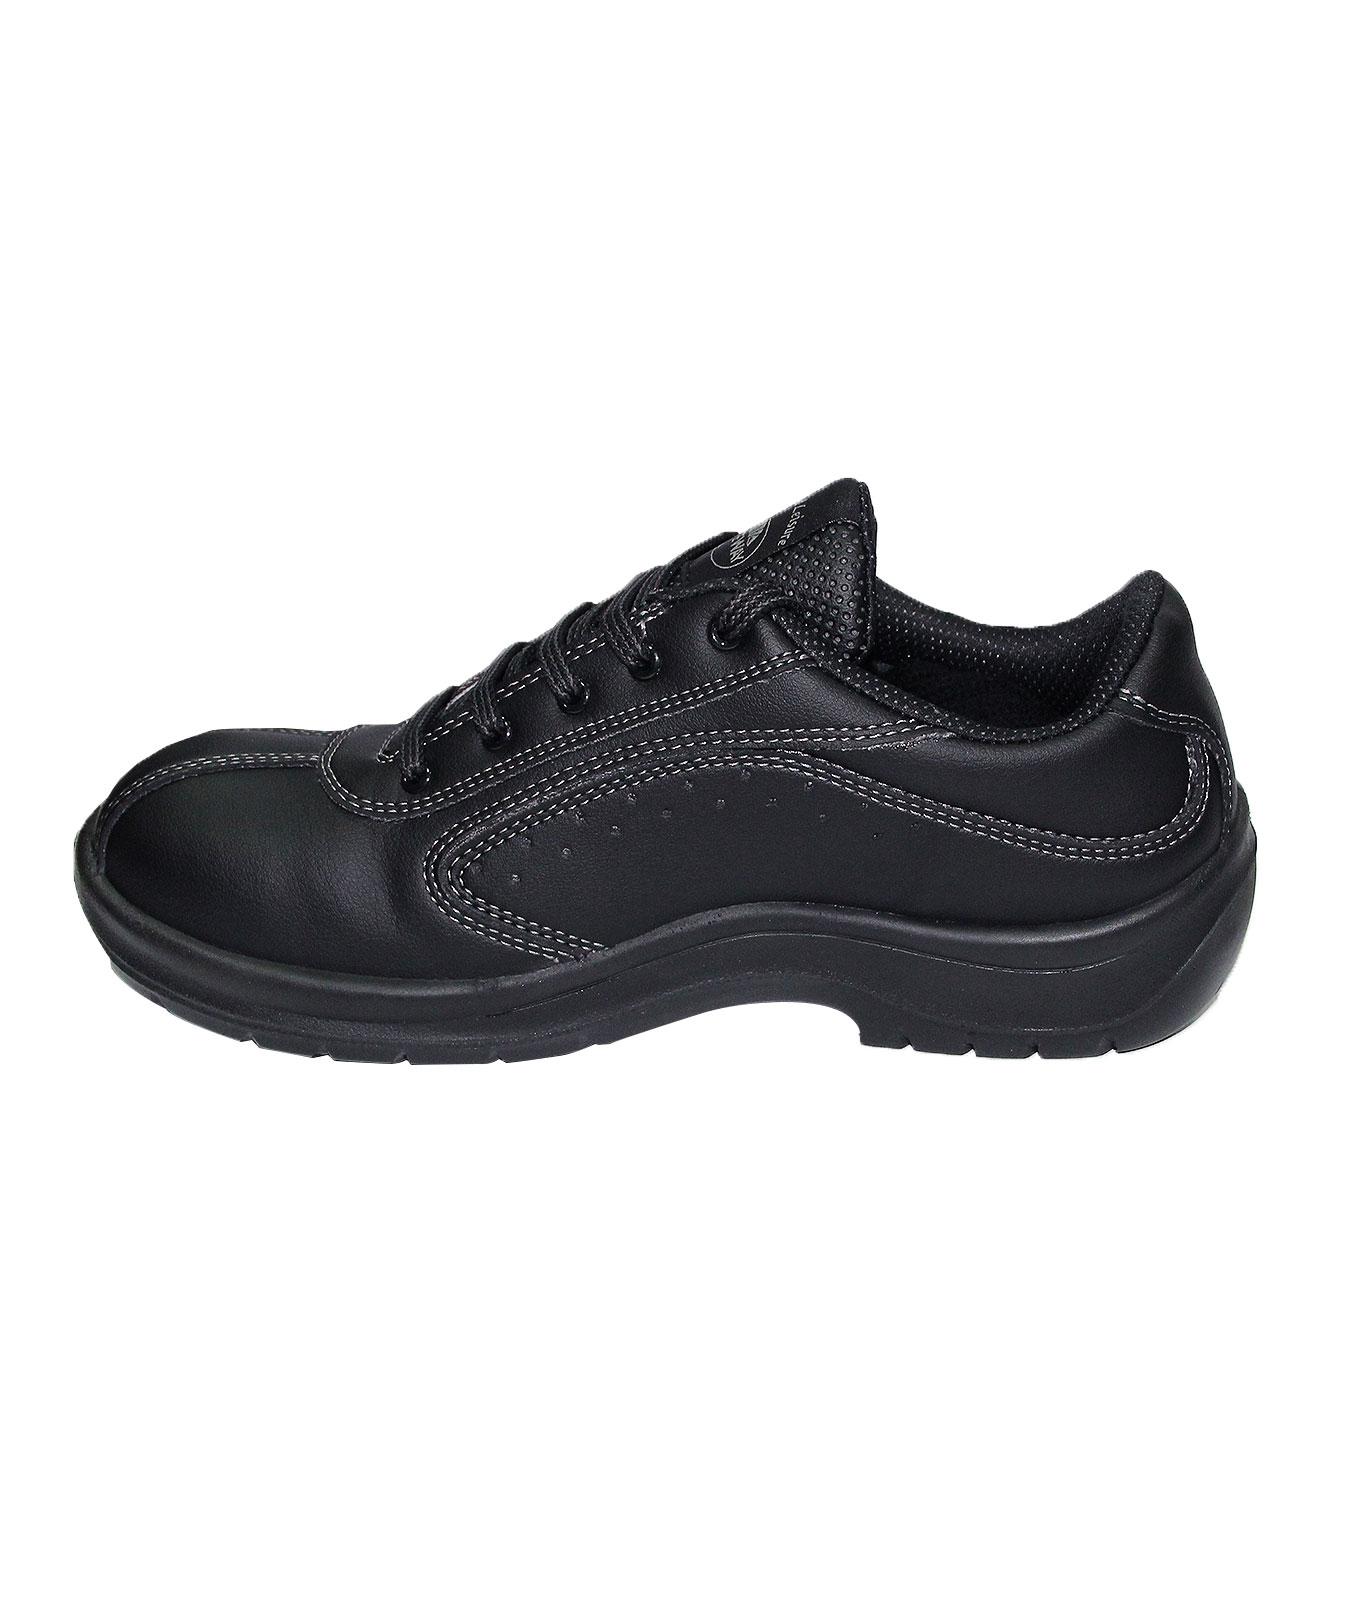 Derby: Εξαιρετικά ελαφριά παπούτσια εργασίας 3